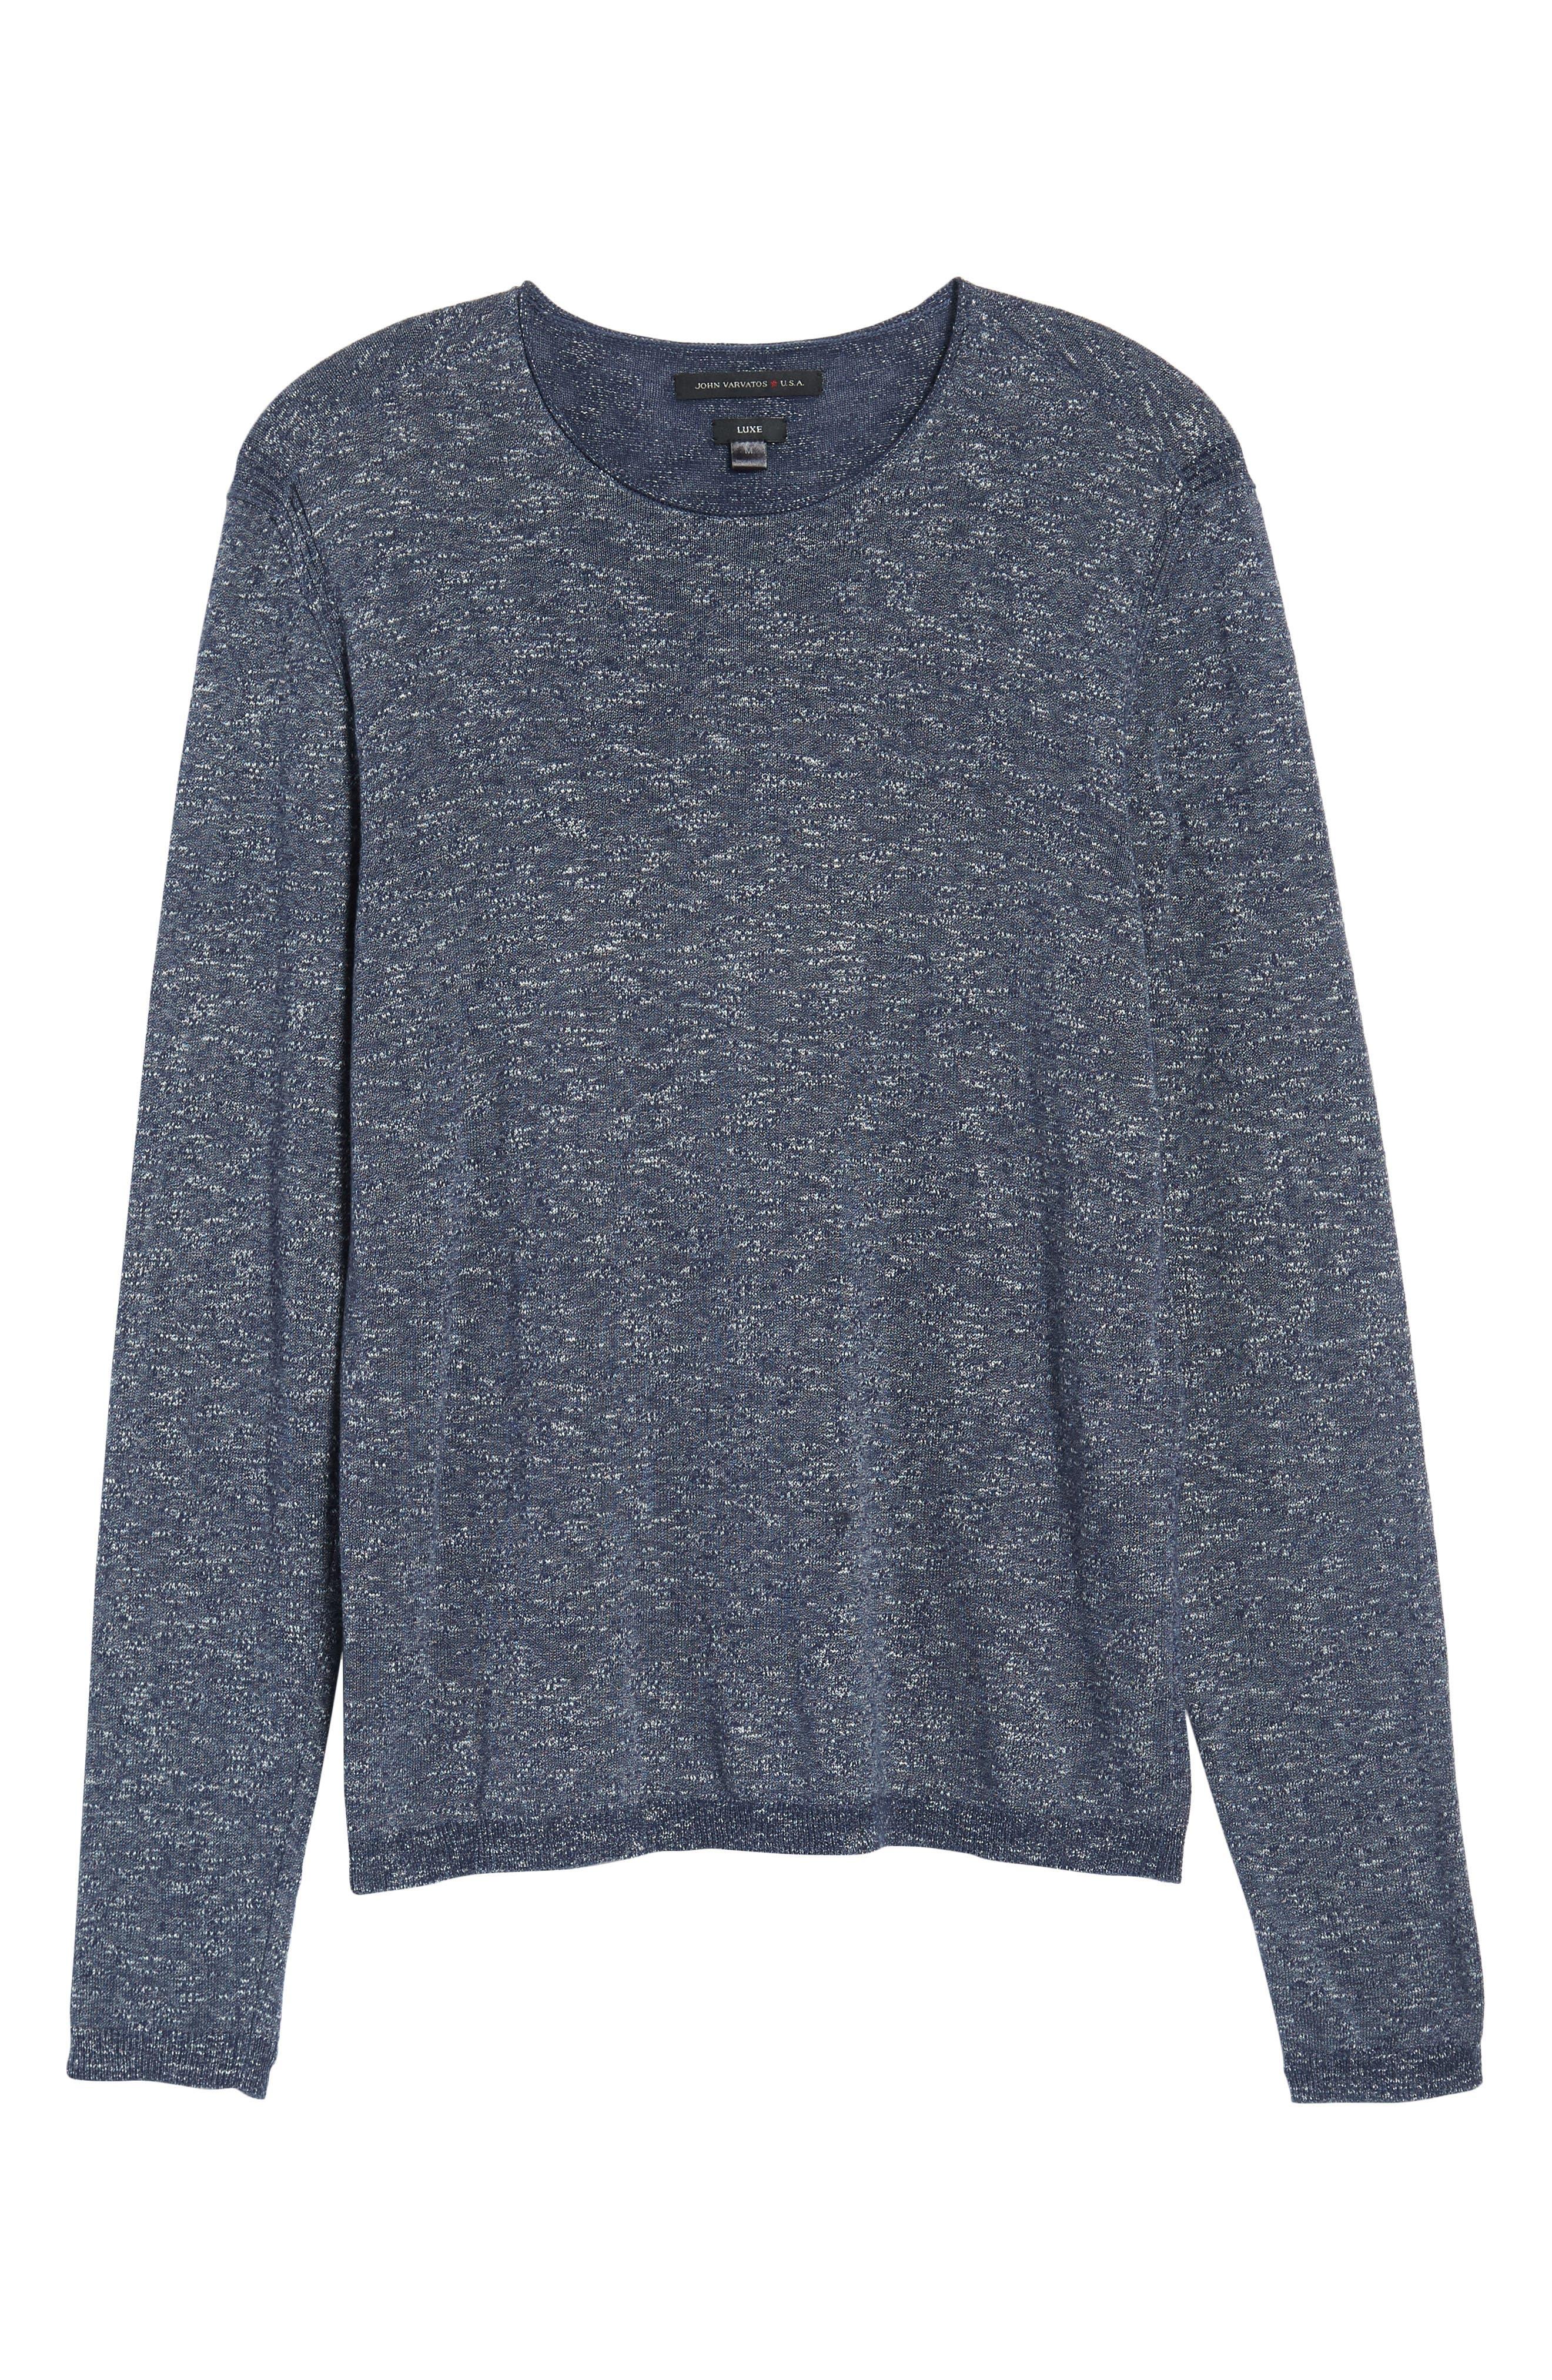 Slim Fit Cotton Blend Sweater,                             Alternate thumbnail 6, color,                             Officer Blue